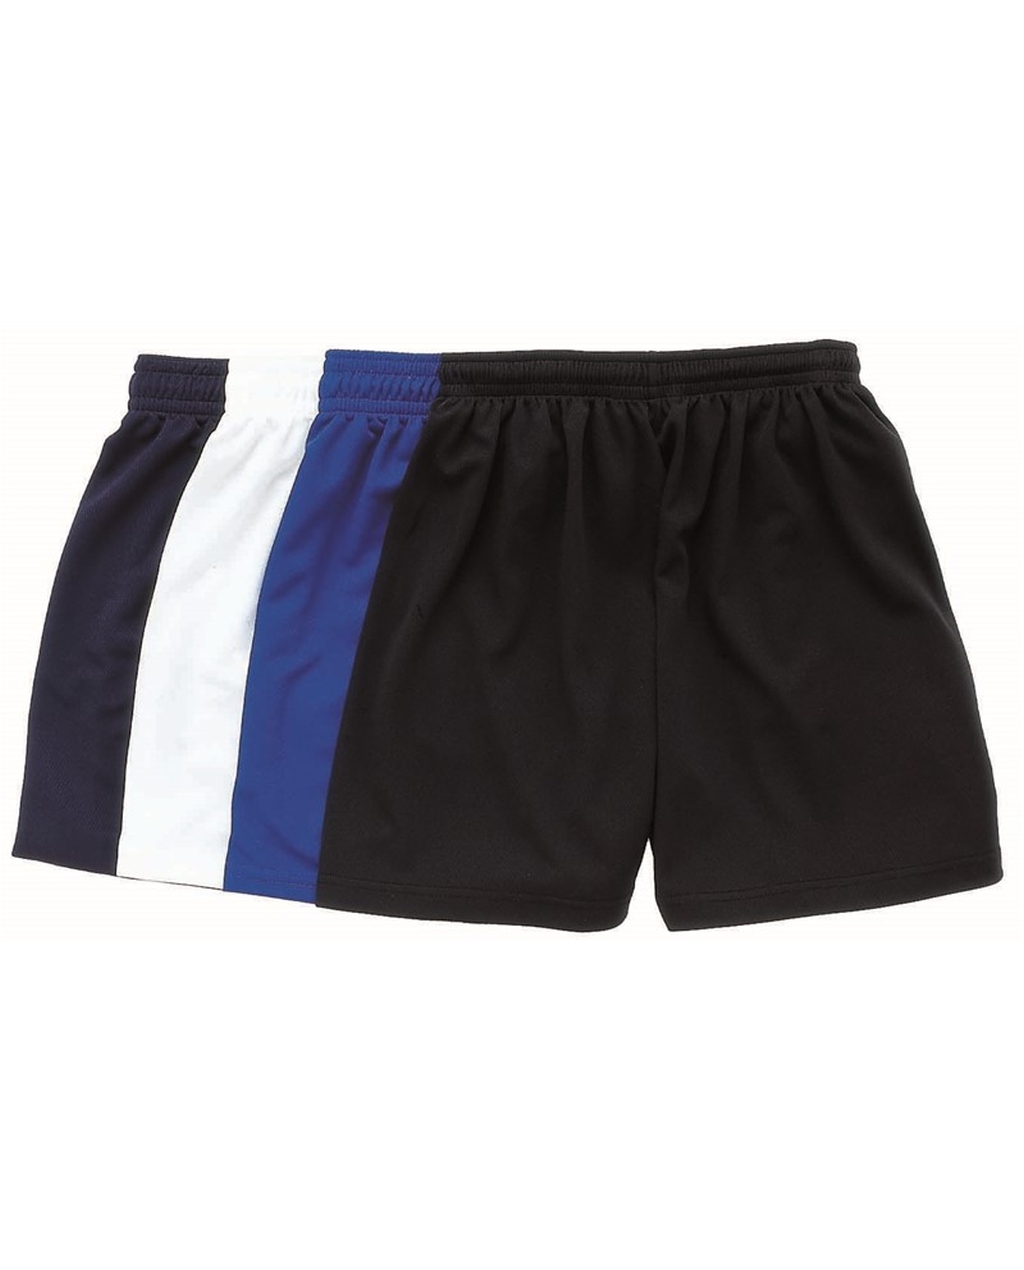 Football Shorts - 32